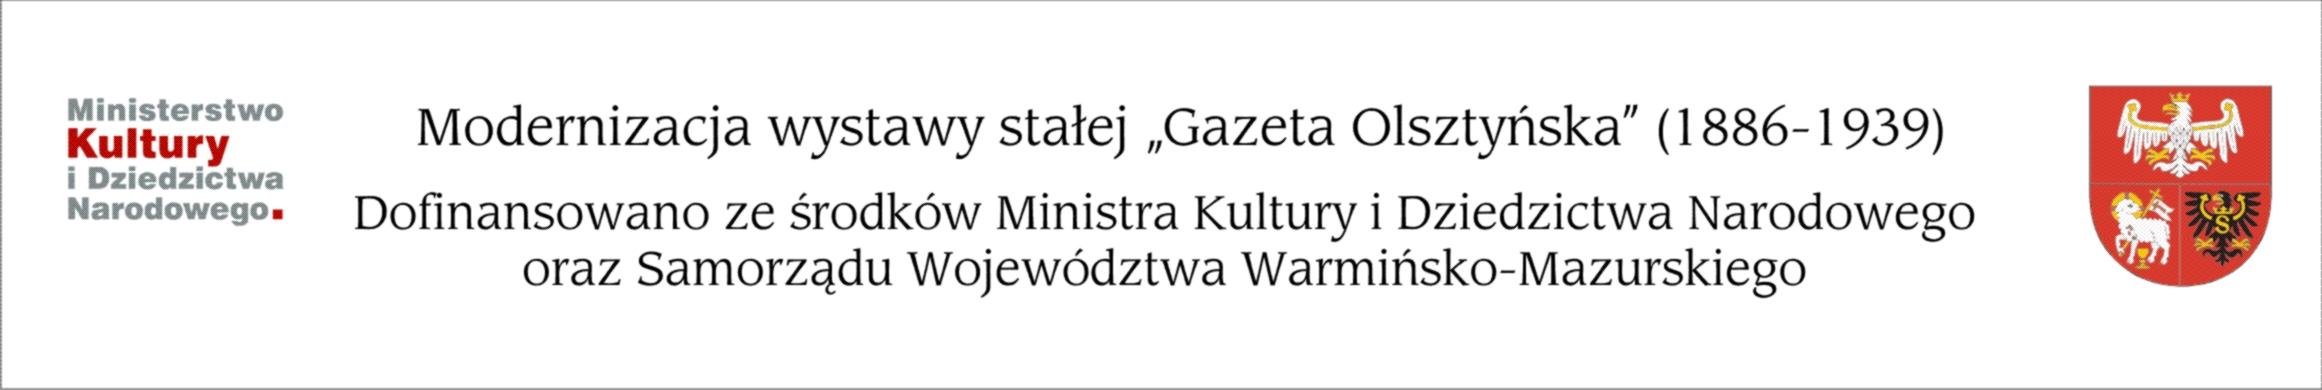 http://m.wmwm.pl/2017/10/orig/modernizacja-logotypy-5880.jpg